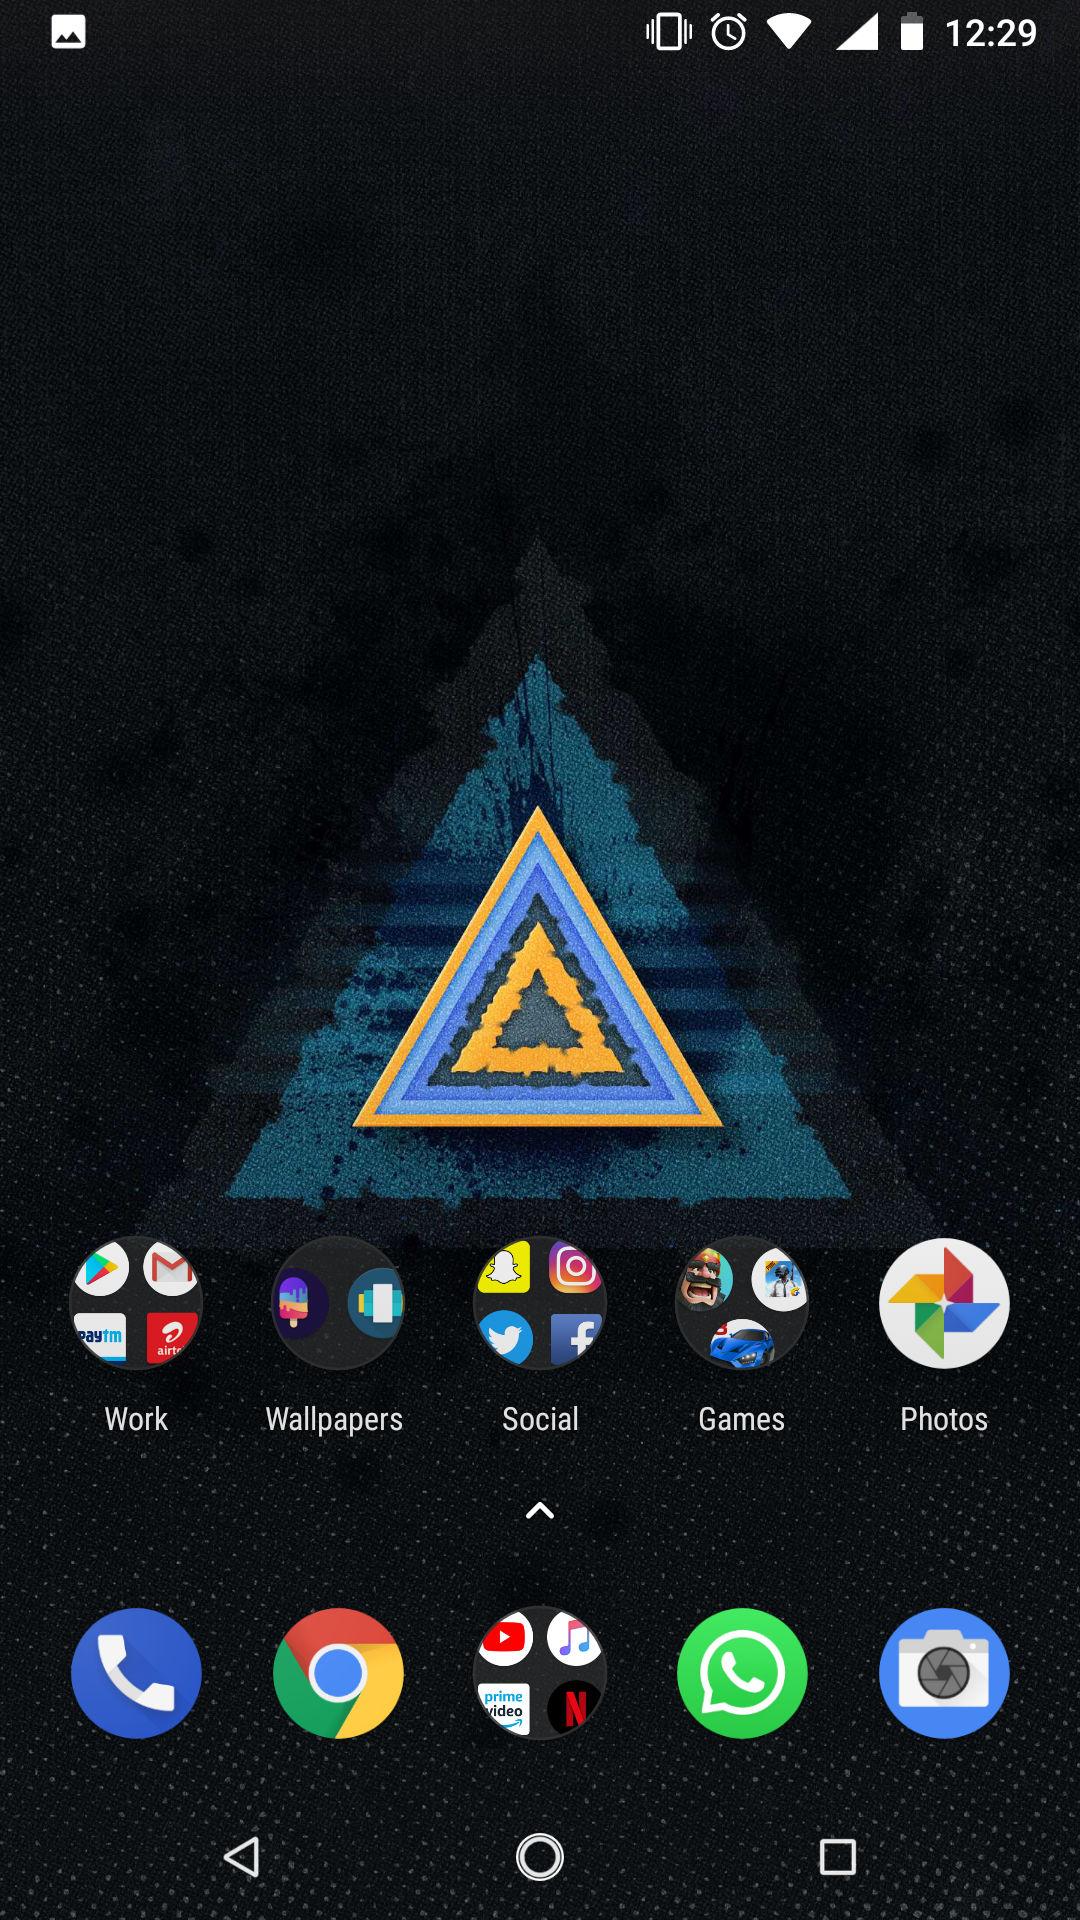 Nokia 6 (2018) UI 1